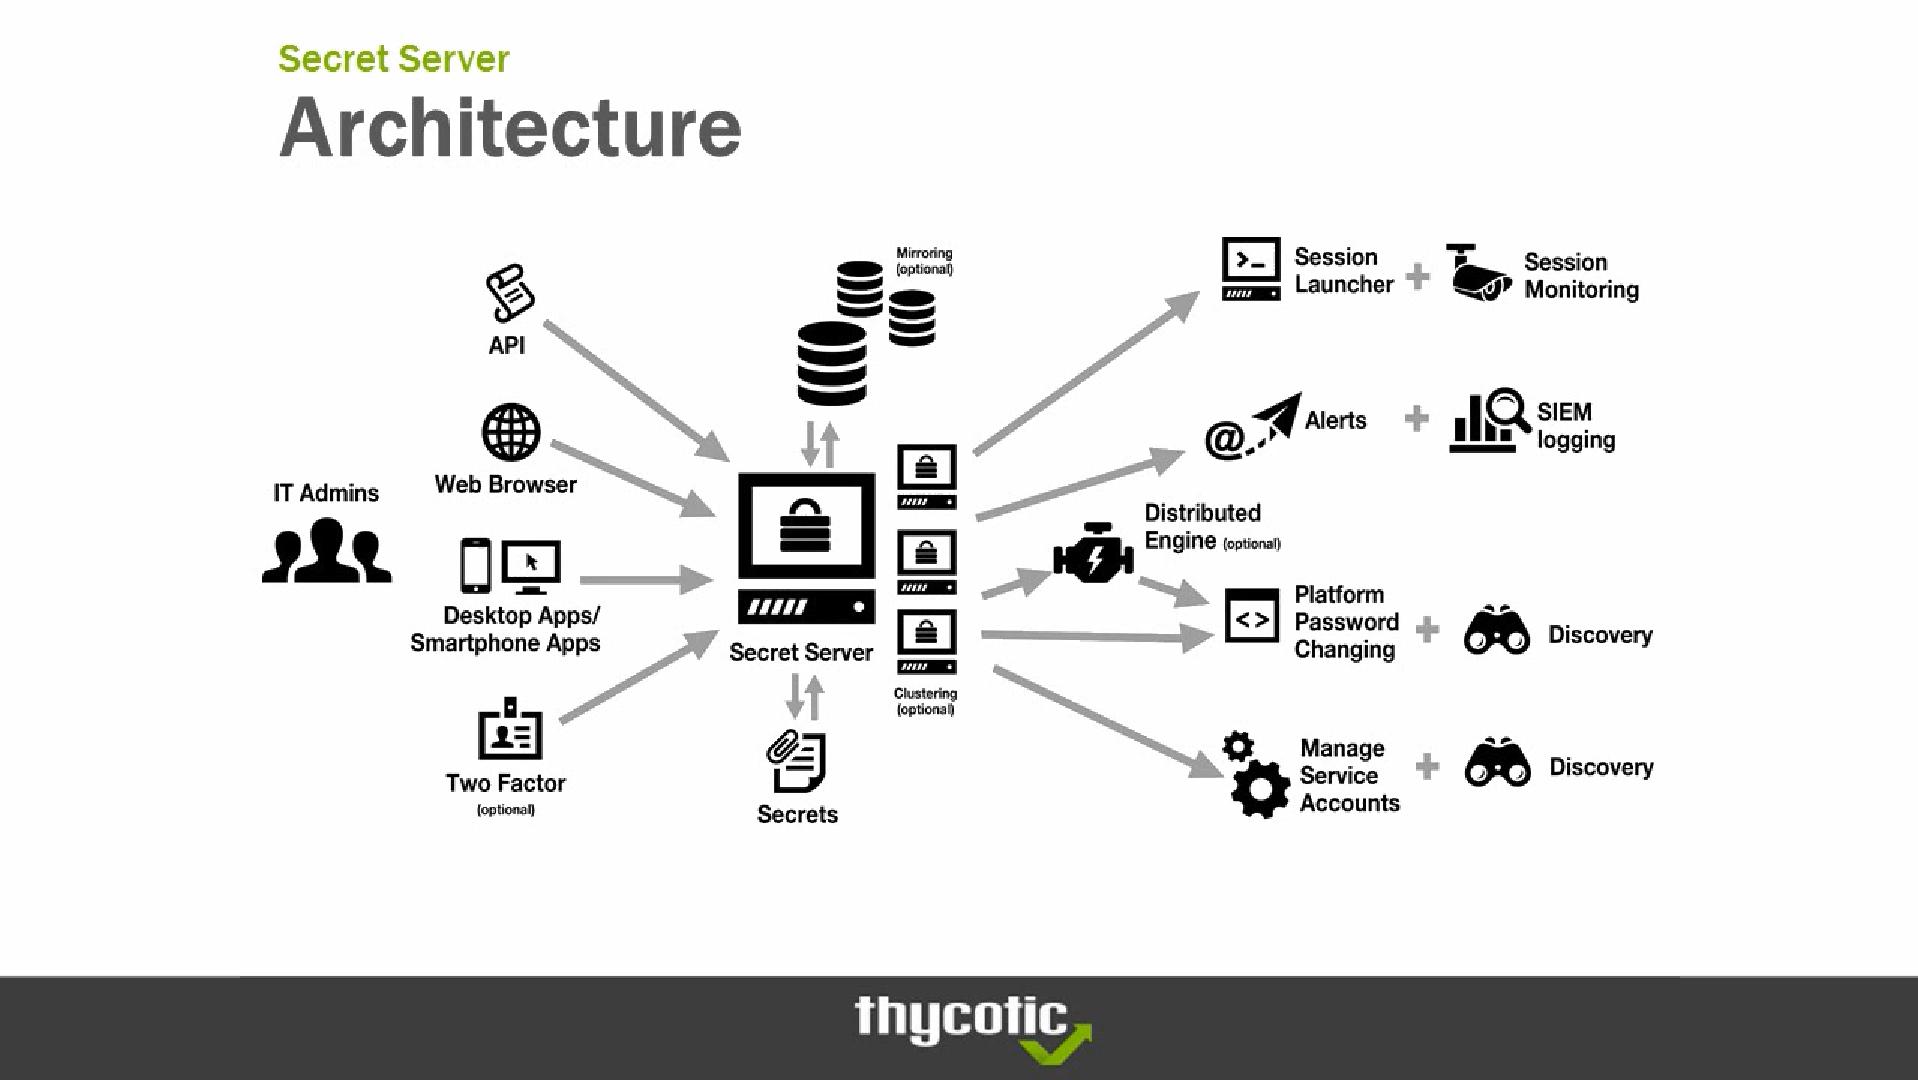 Secret Server architecture